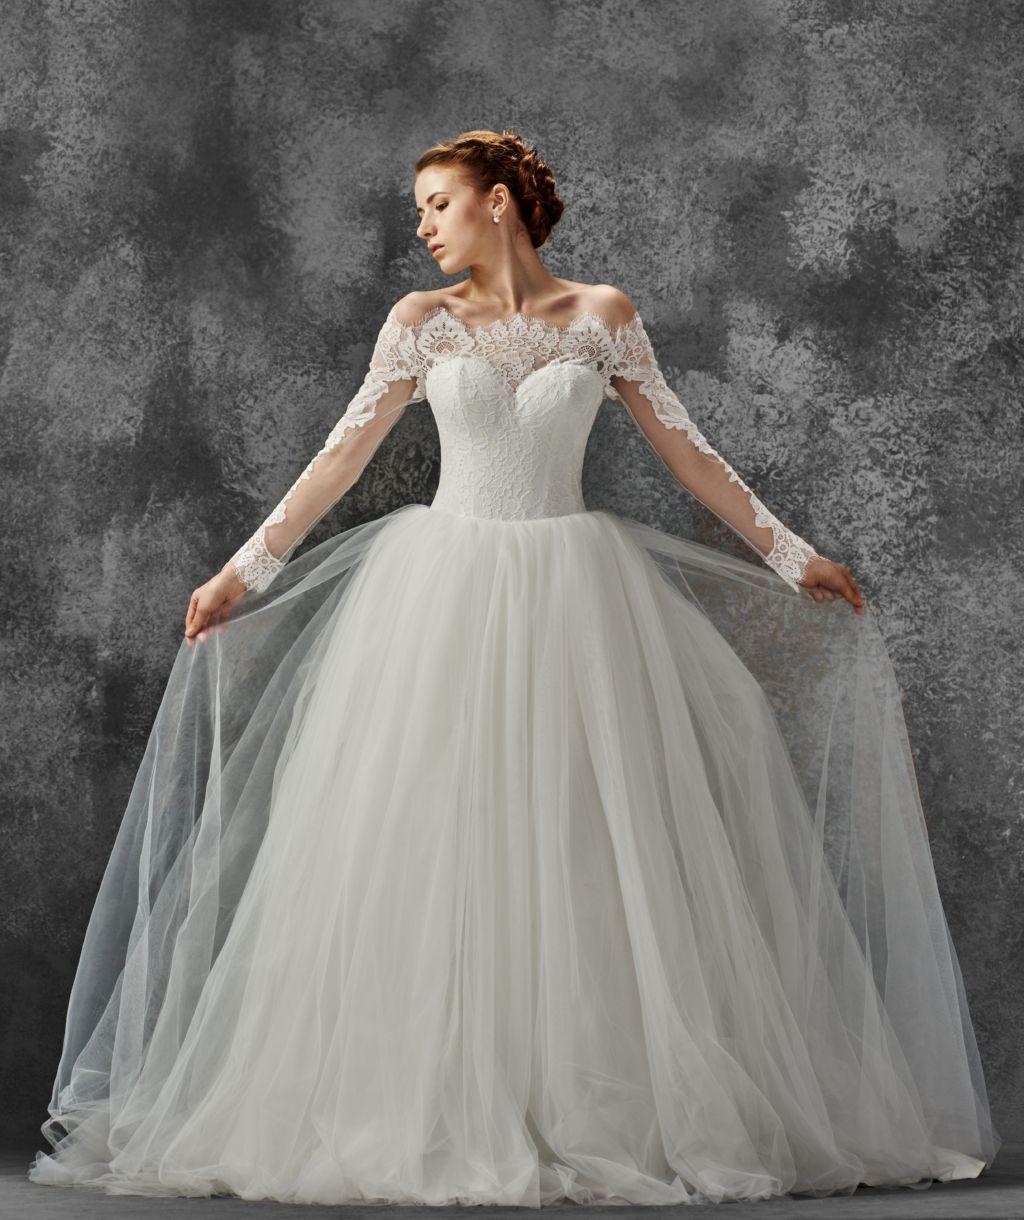 Beach wedding dress boho wedding dress romantic wedding dress by